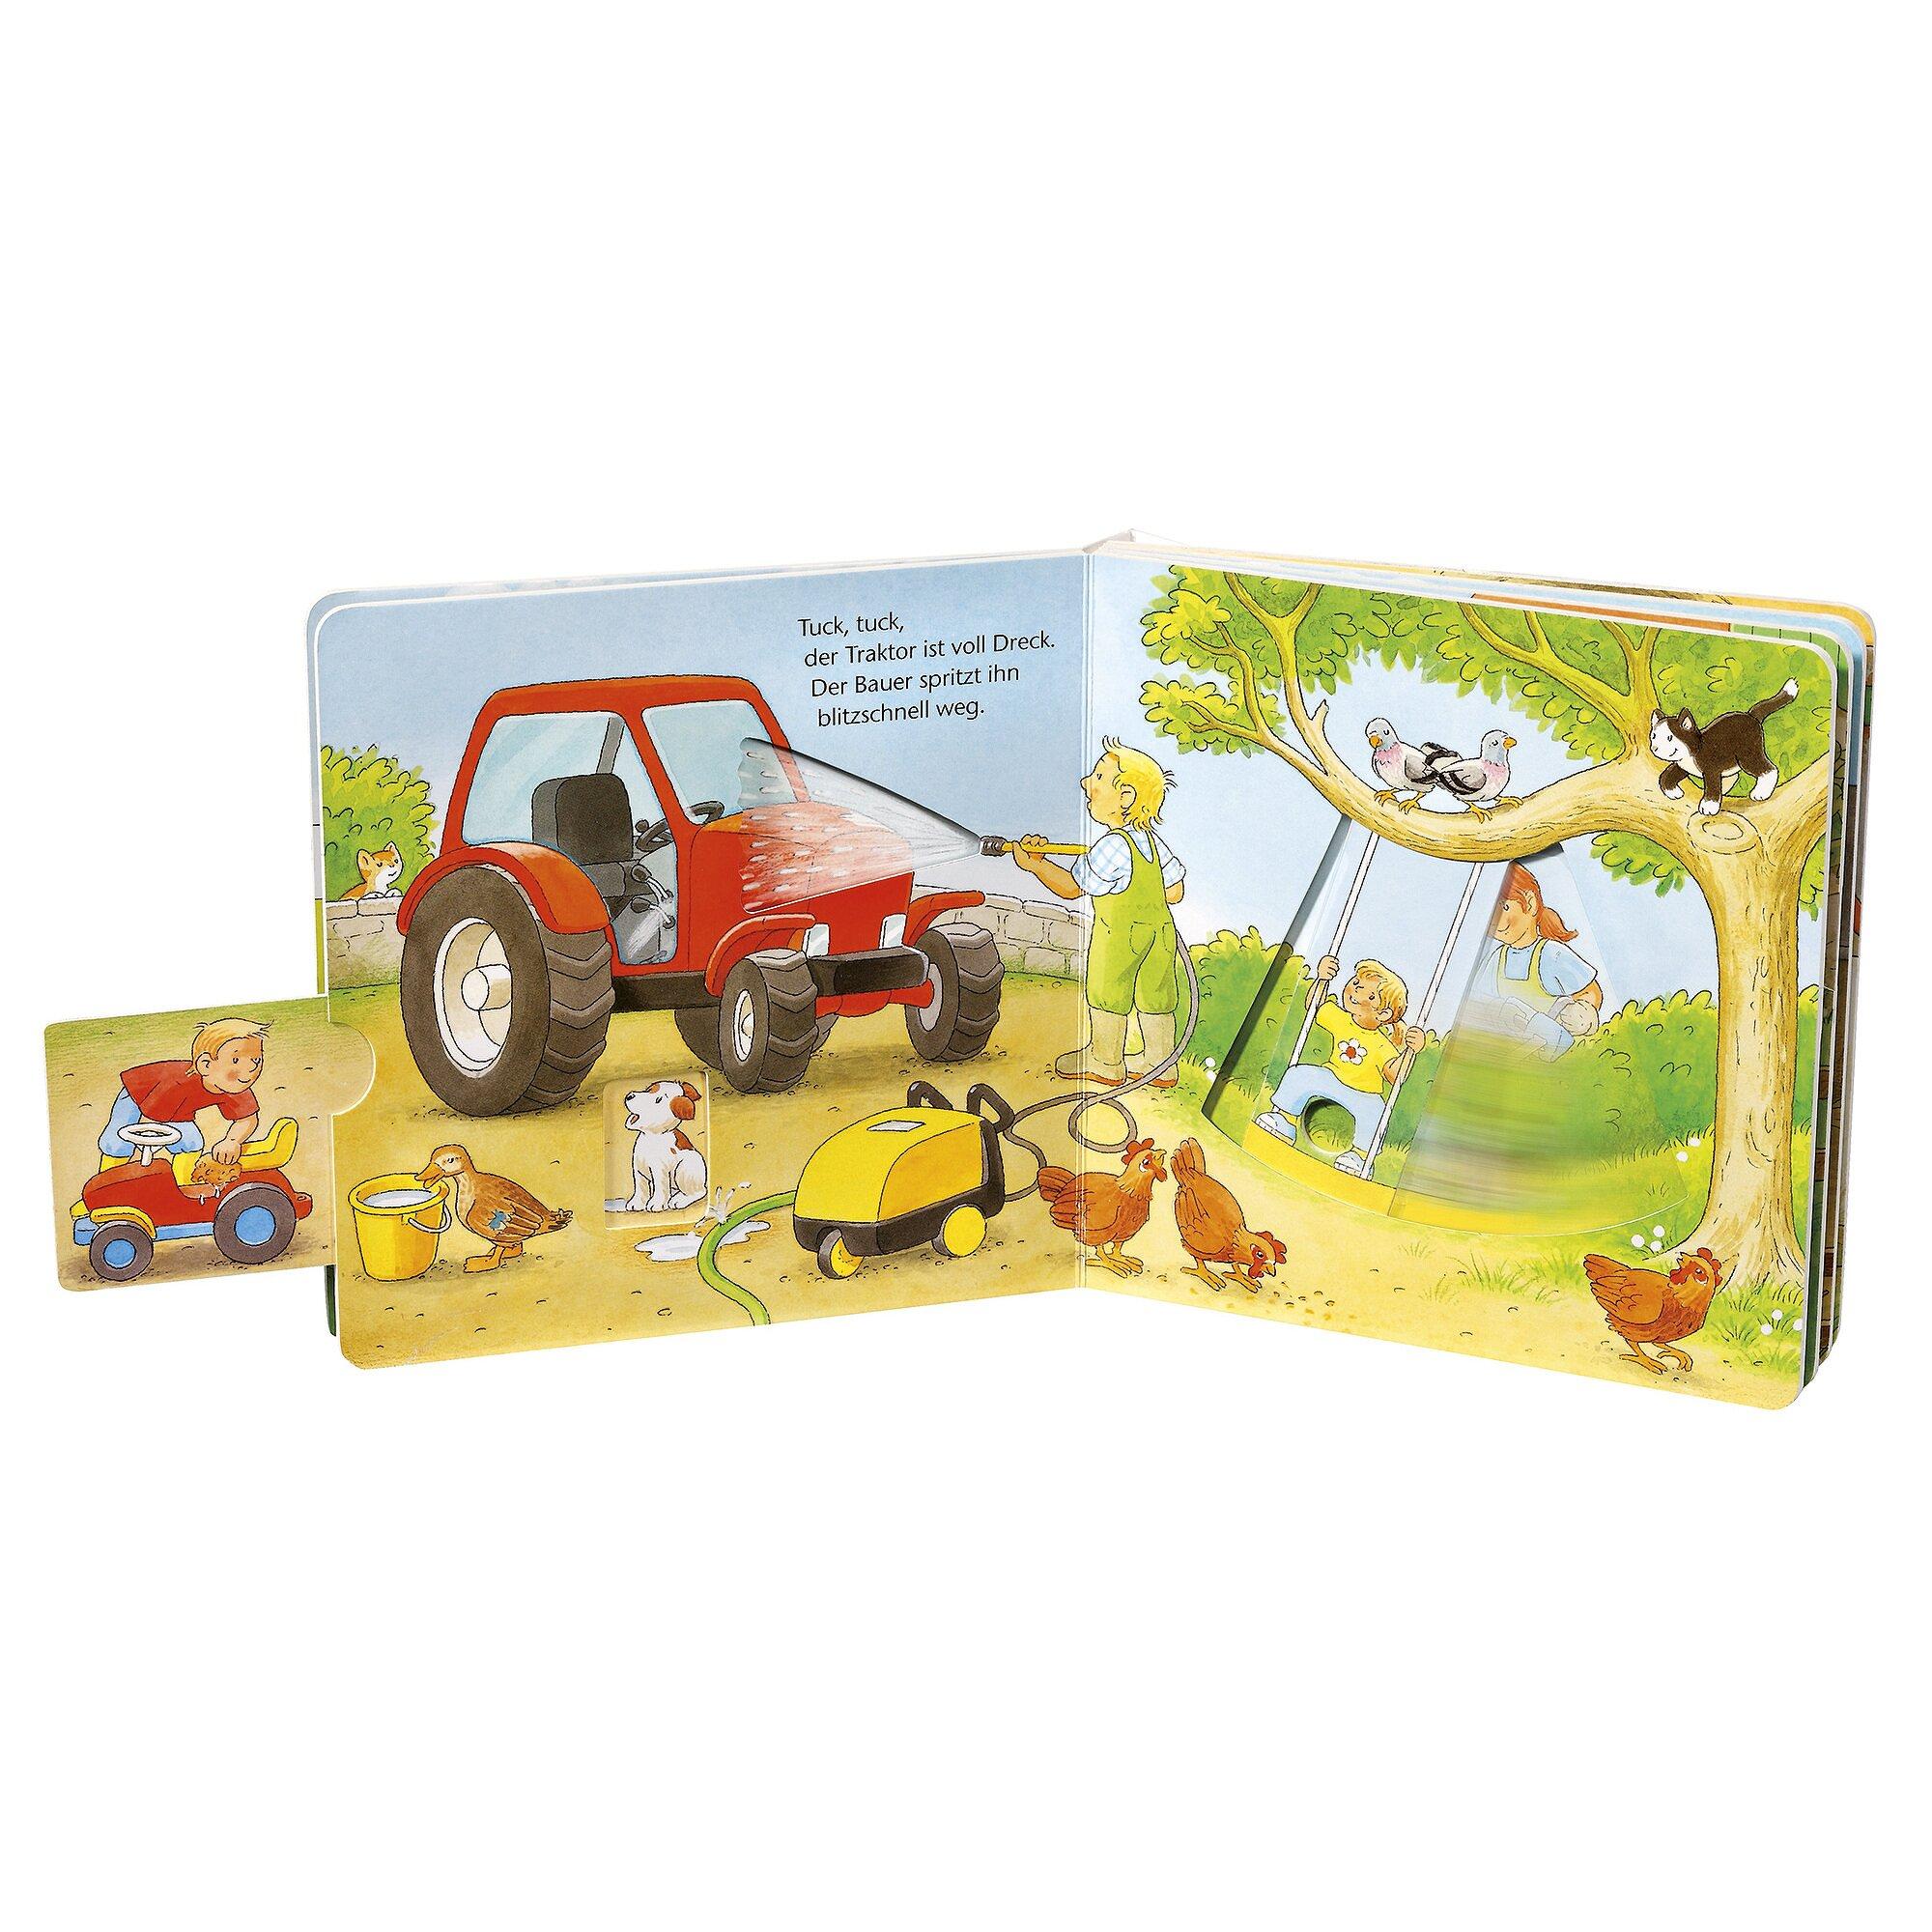 ministeps-tuck-tuck-mein-traktor-